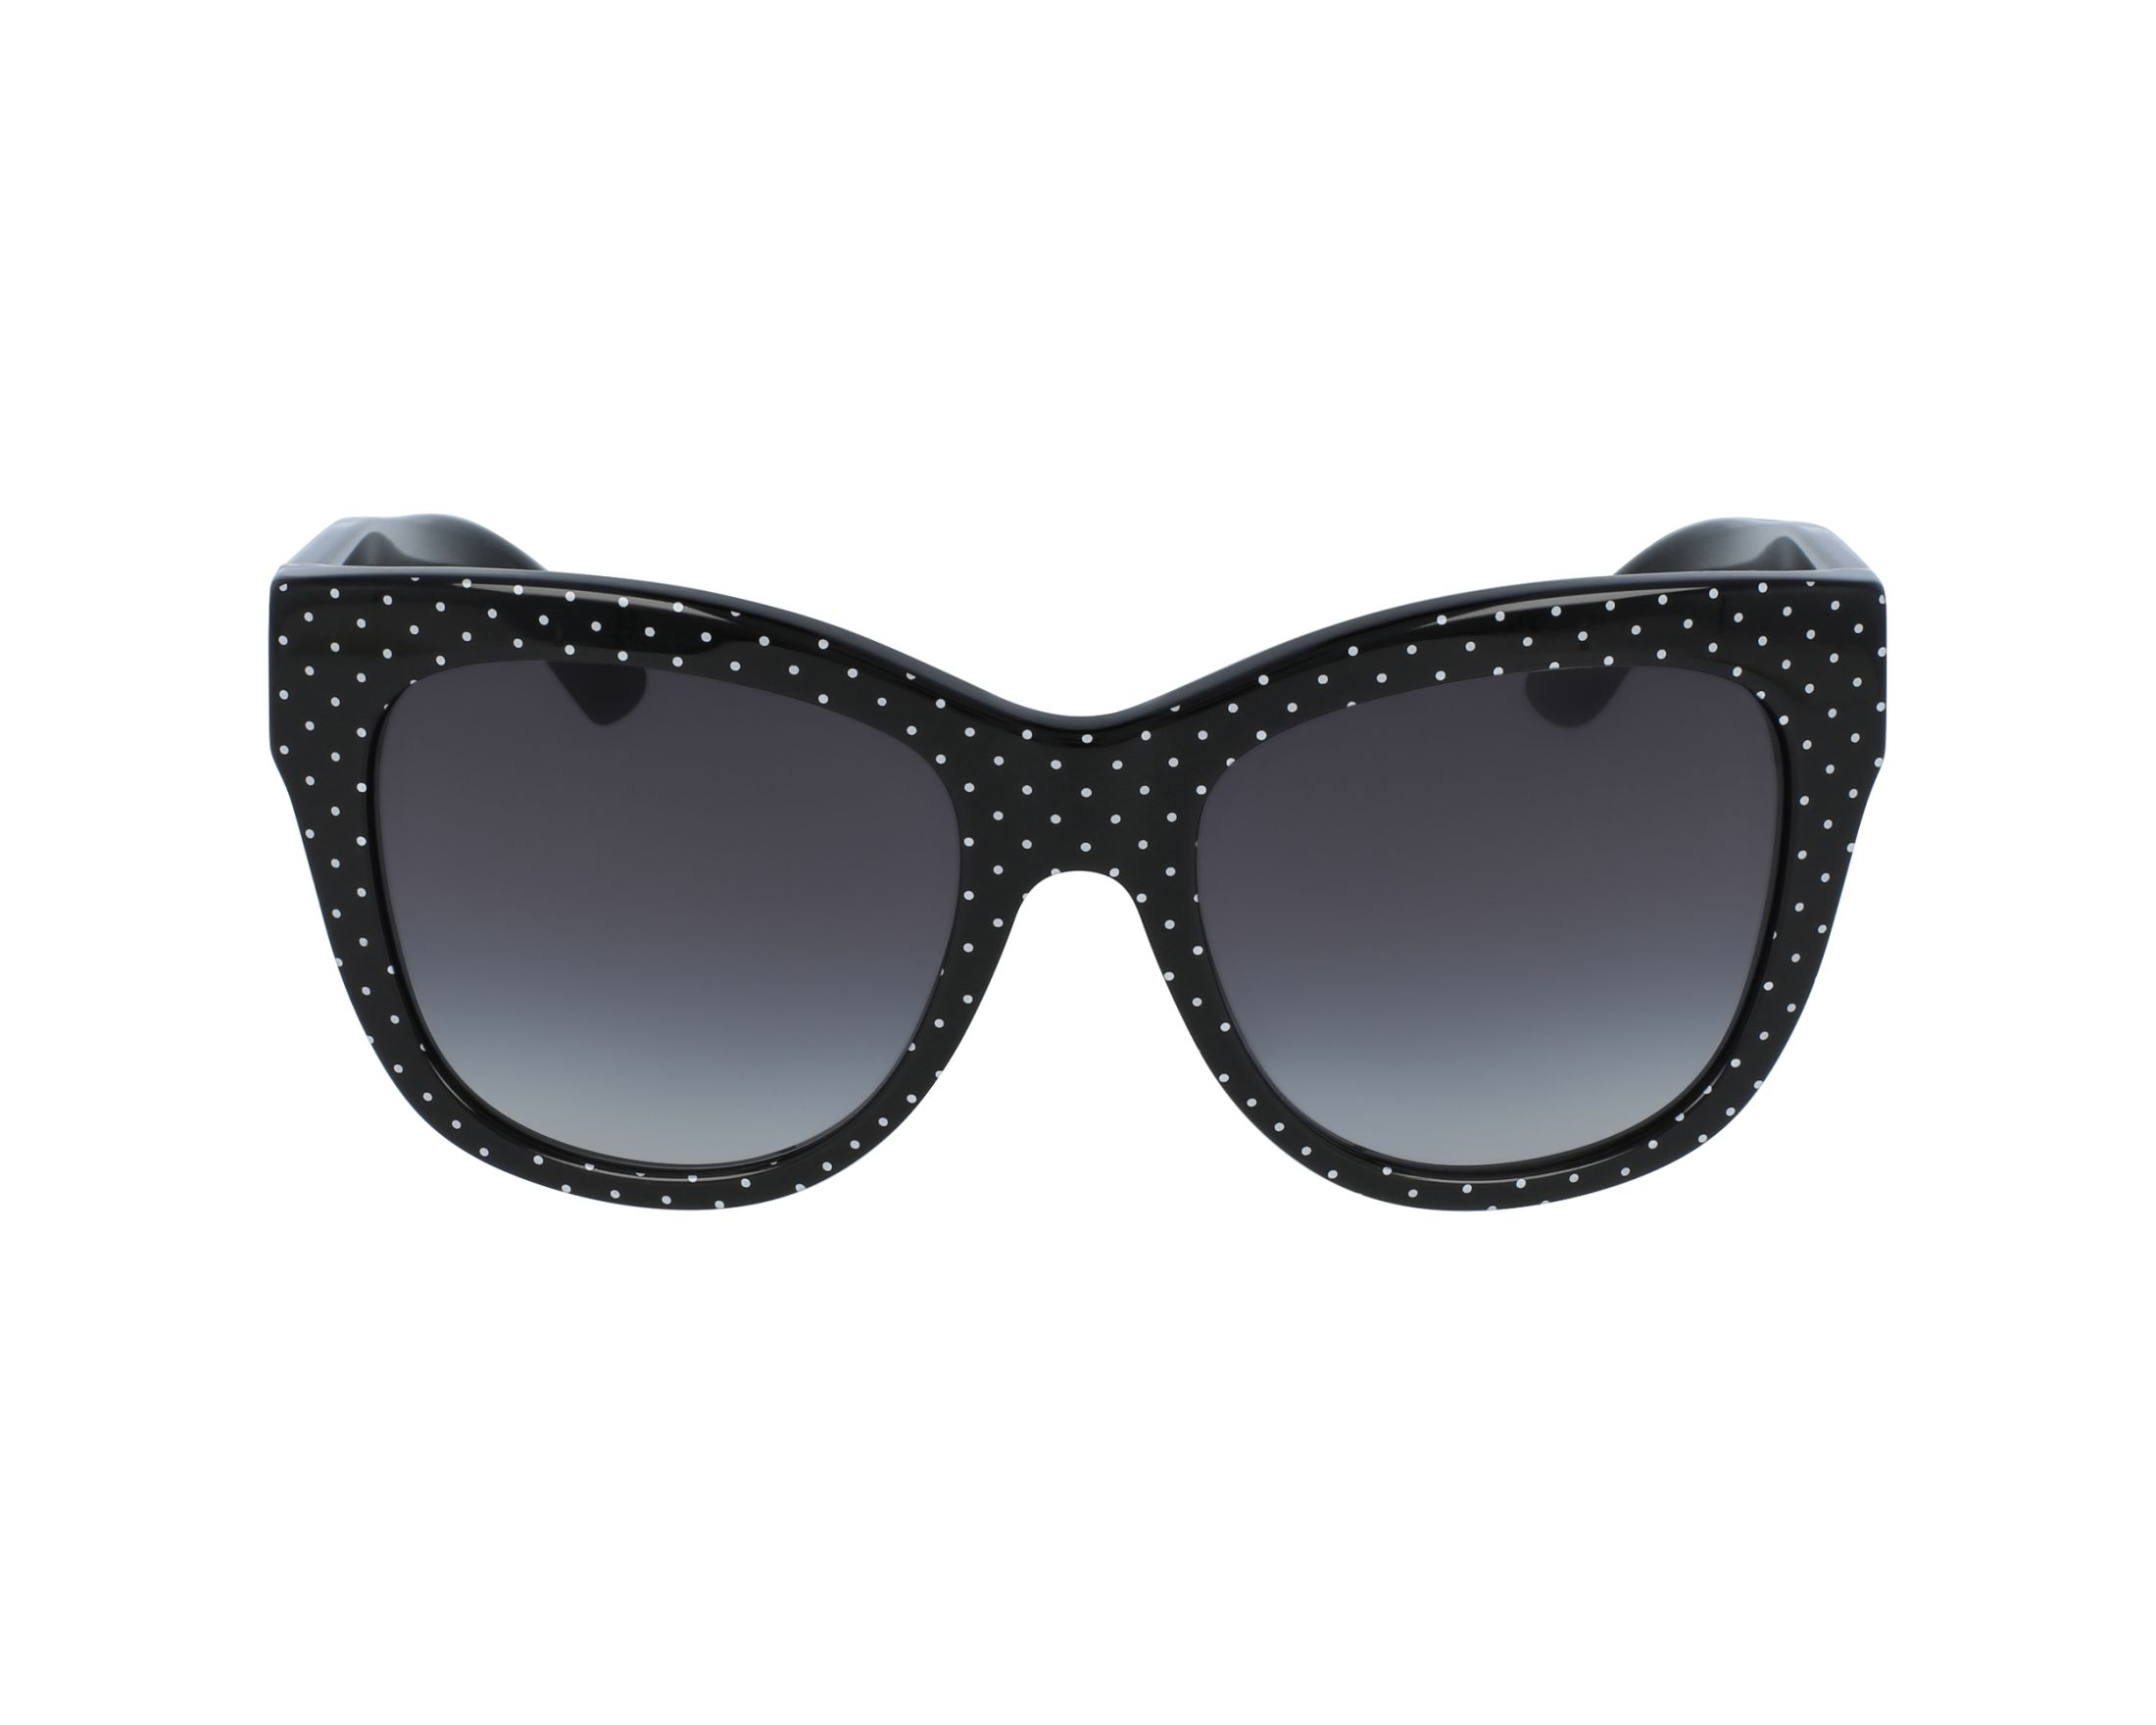 a4c9d23b7 Sunglasses Dolce & Gabbana DG-4270 3126/8G 55-19 Black White profile